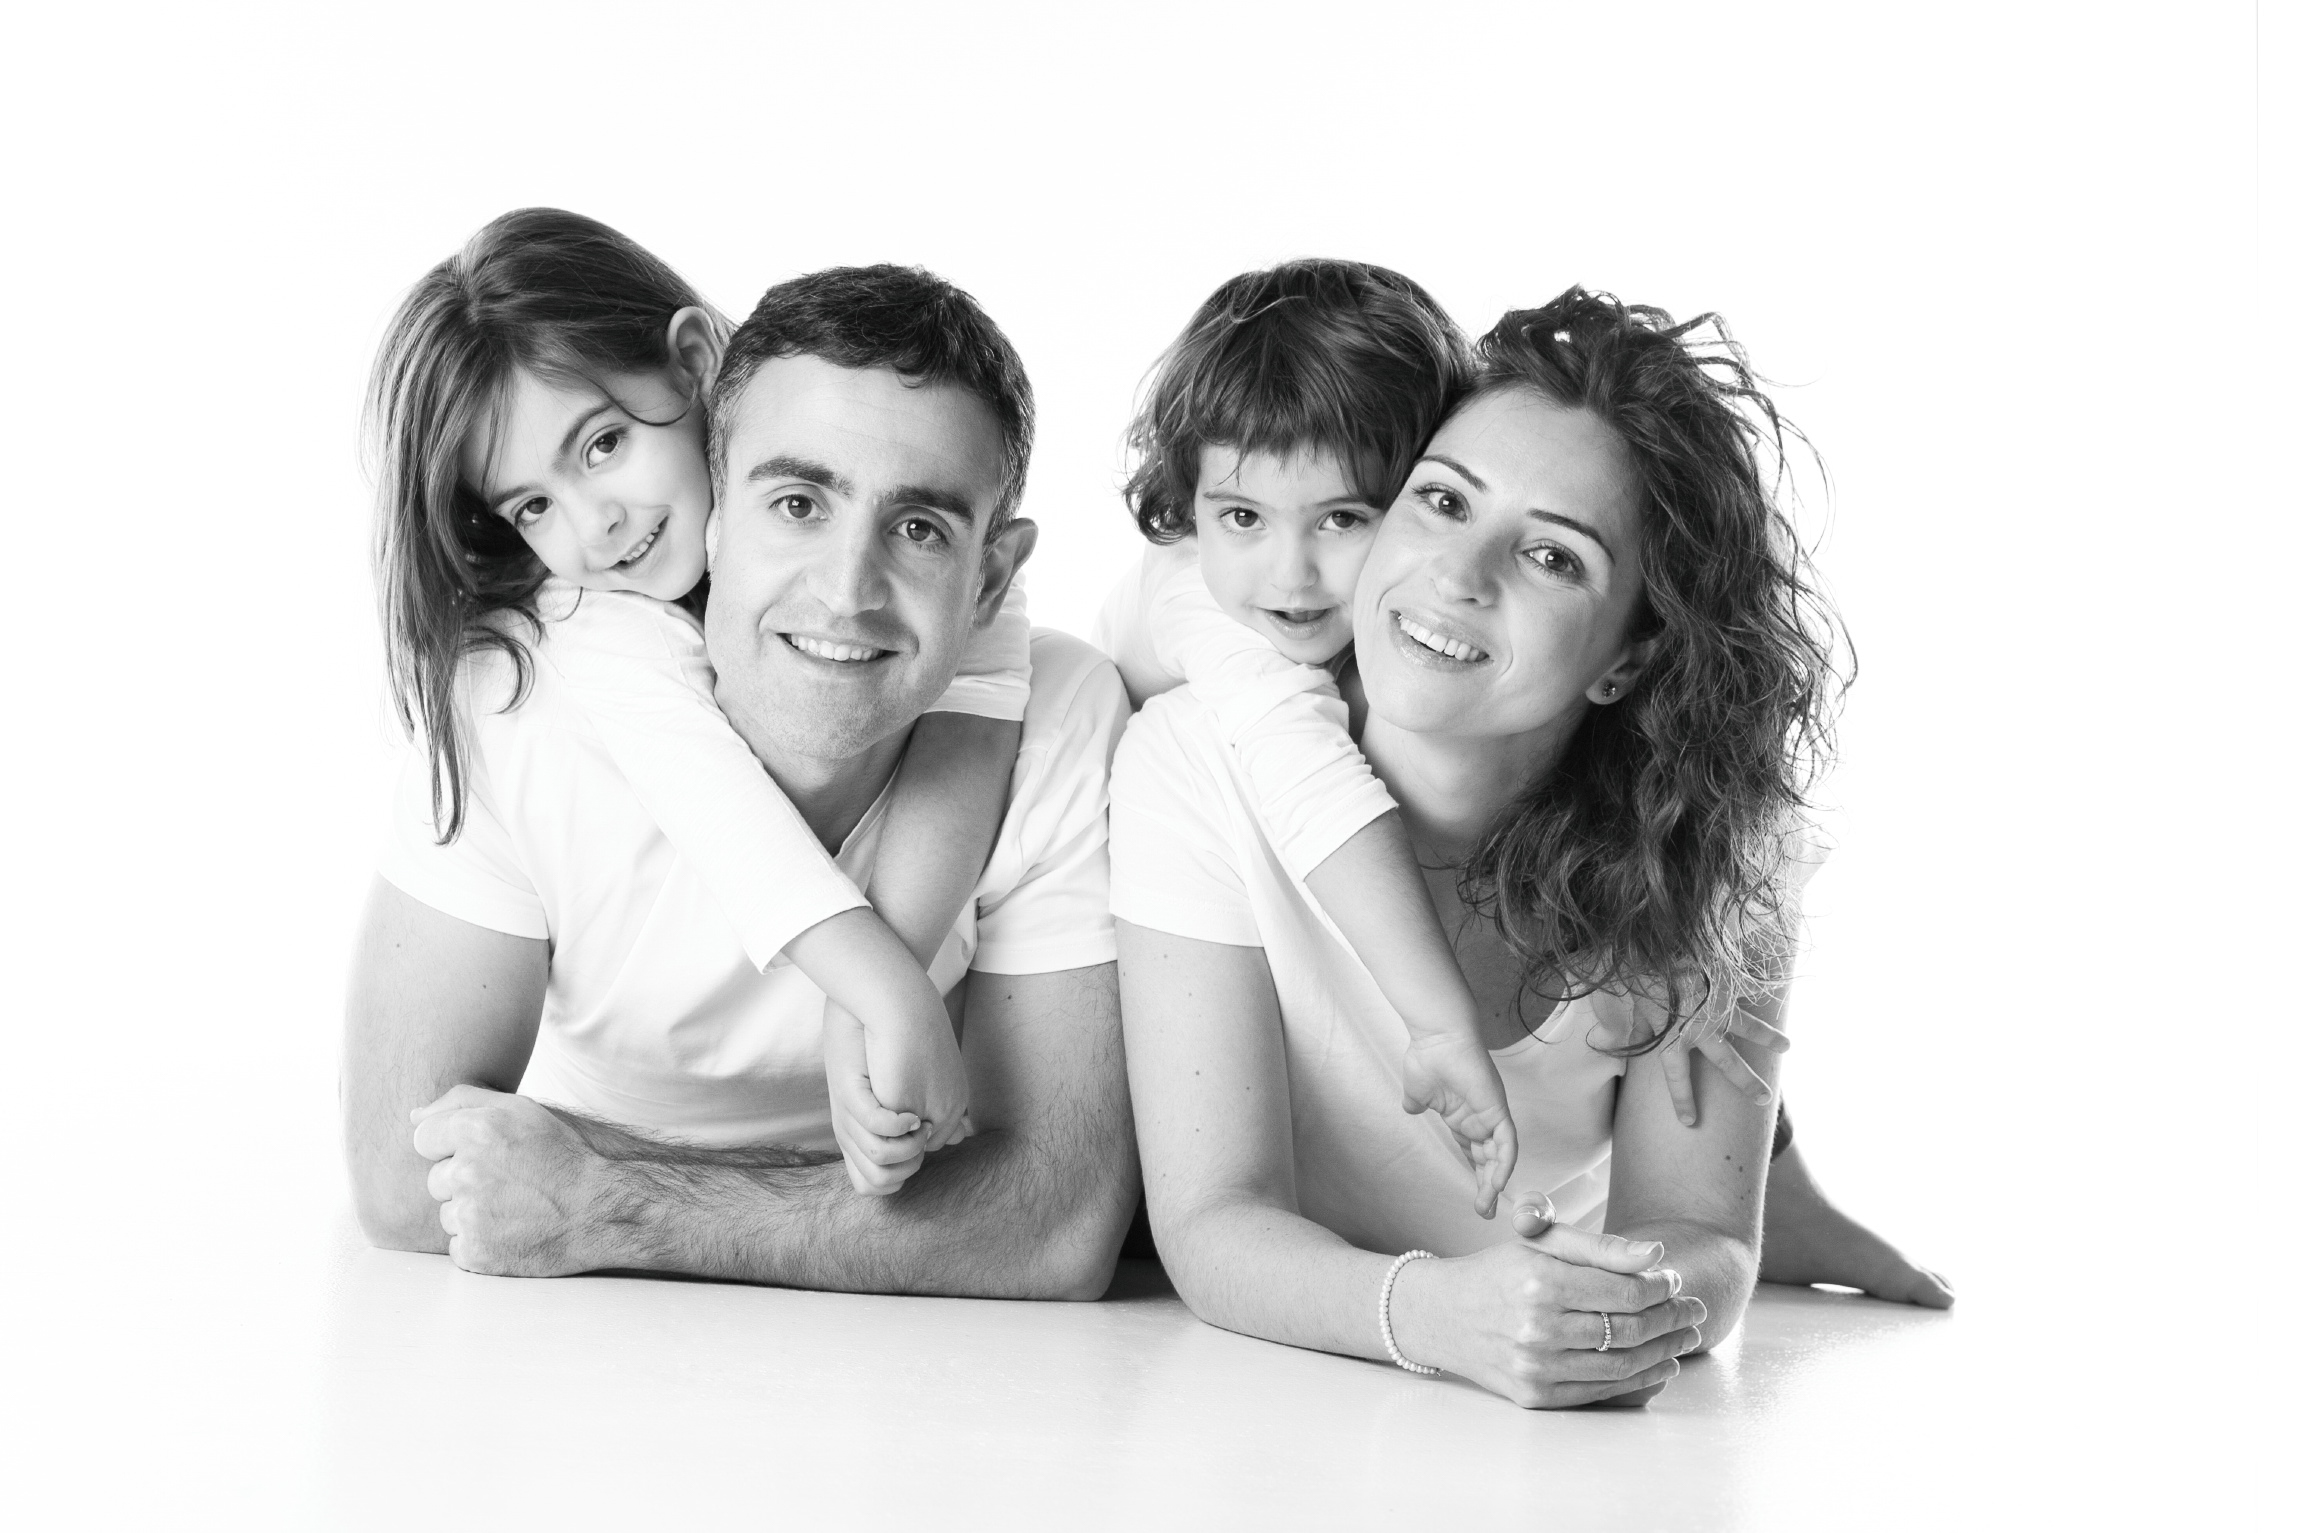 03-foto-familia-celine-pech-andorra98